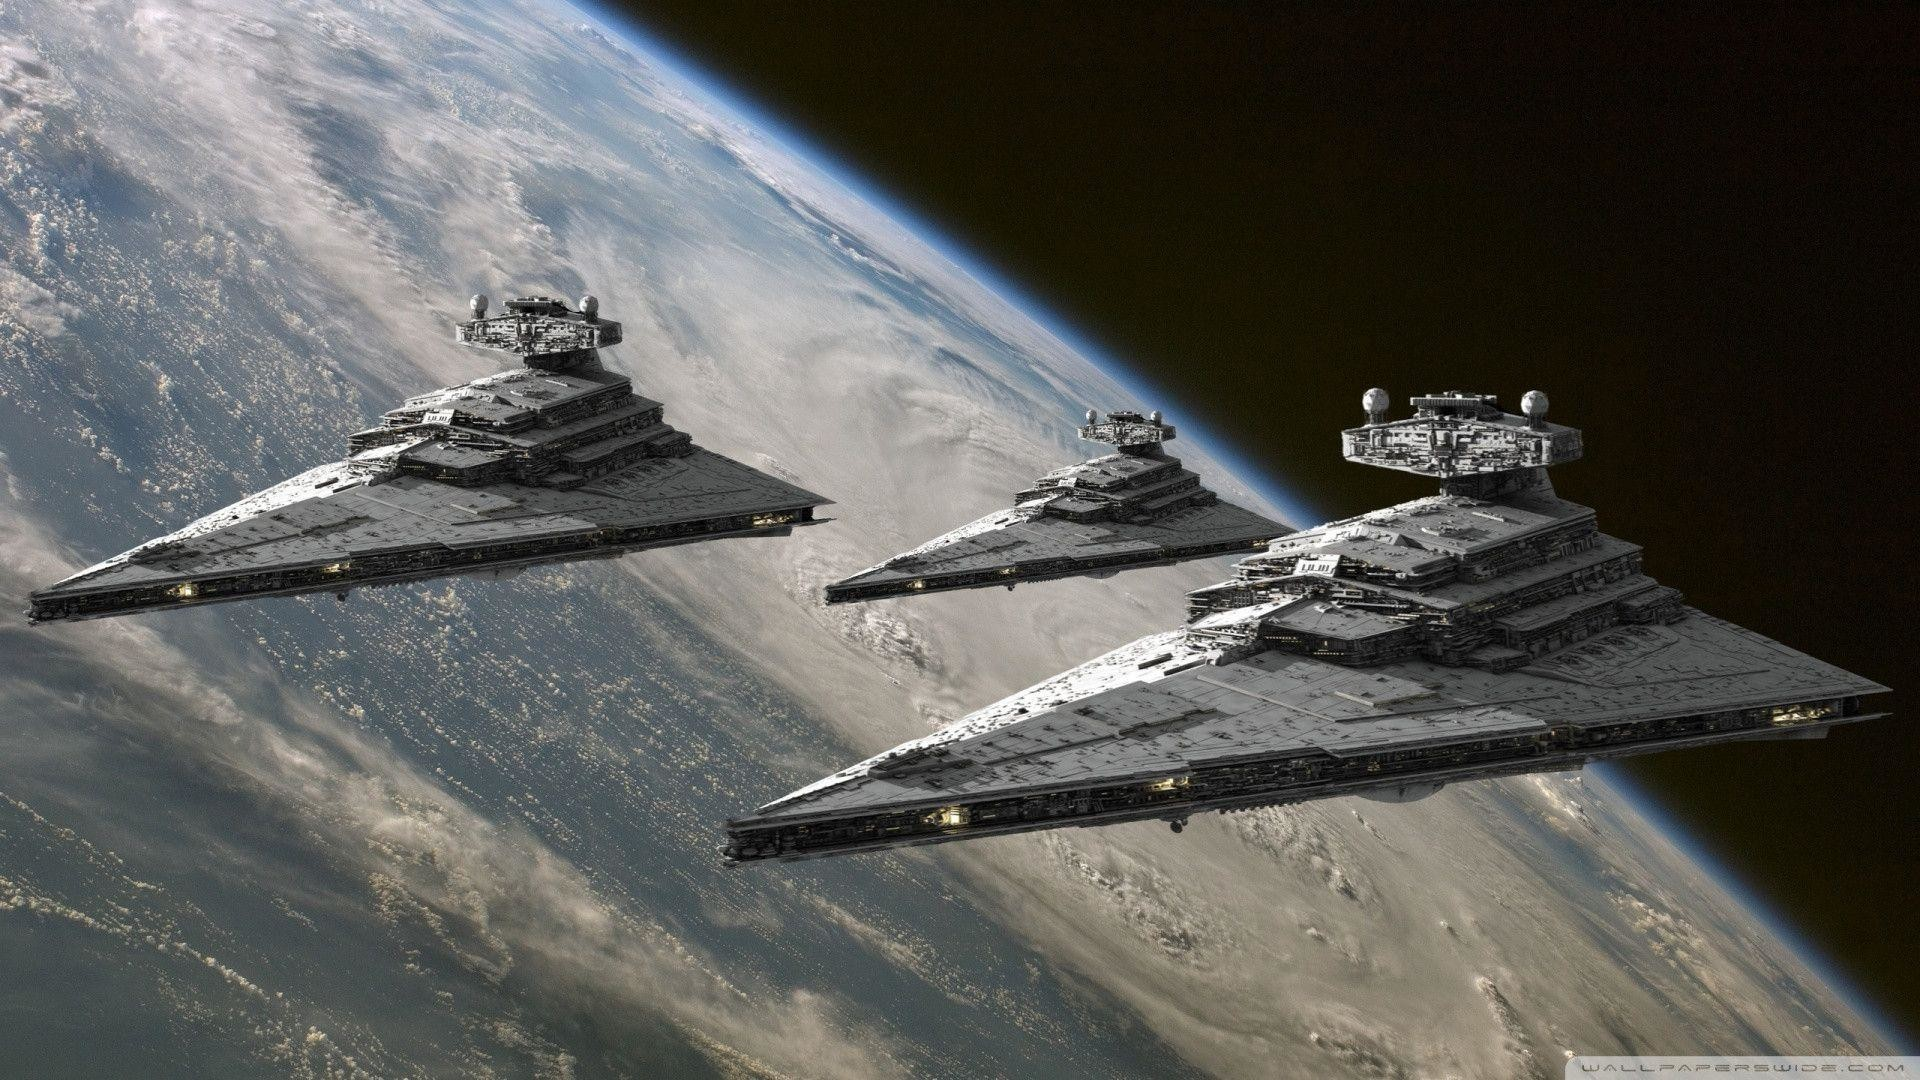 Imperial Star Destroyer wallpaper – 883415